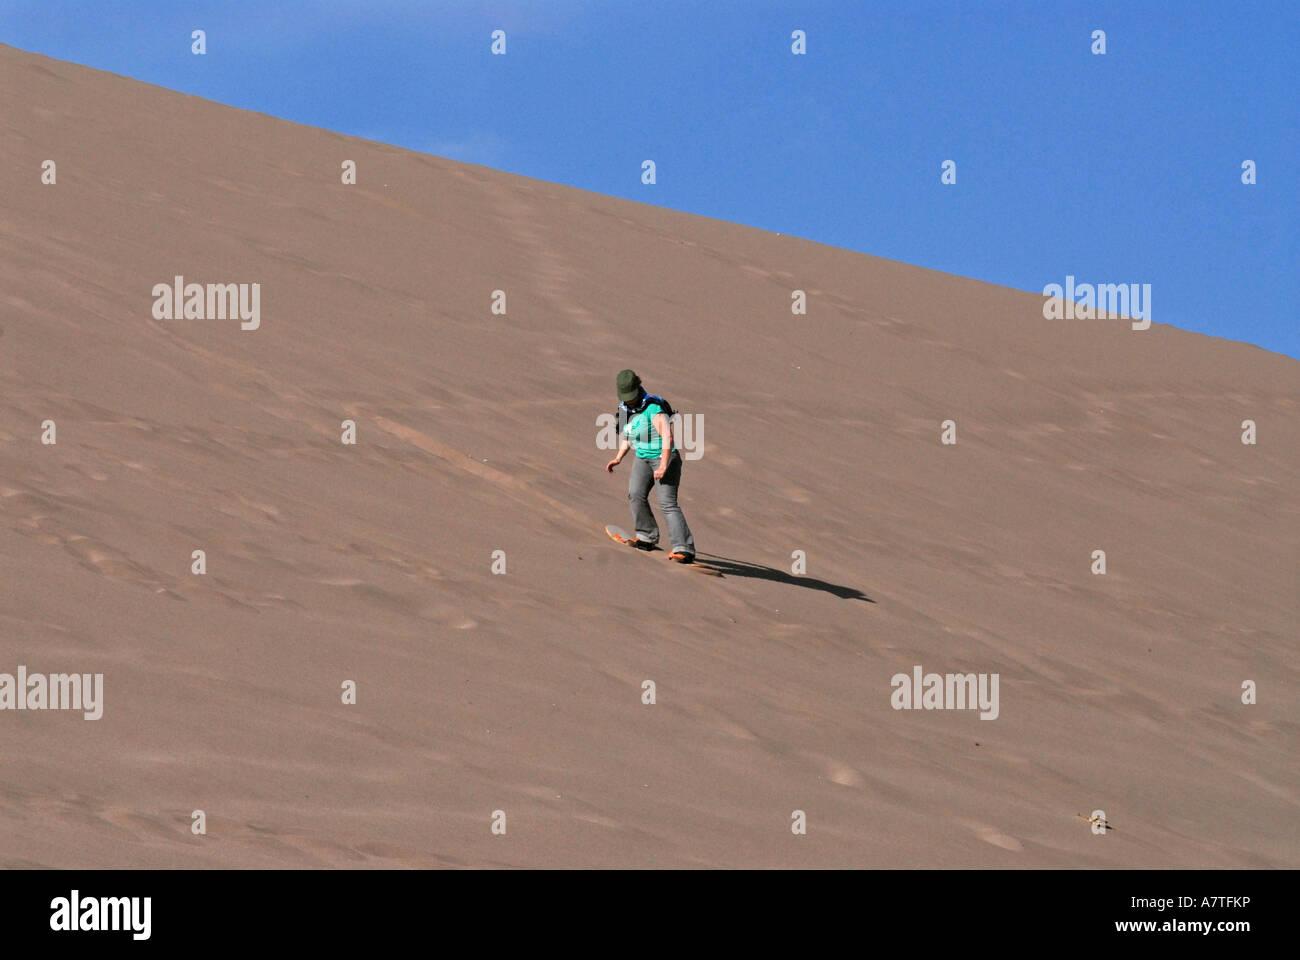 Sandboard  Valley de la luna Atacama desert Chile - Stock Image